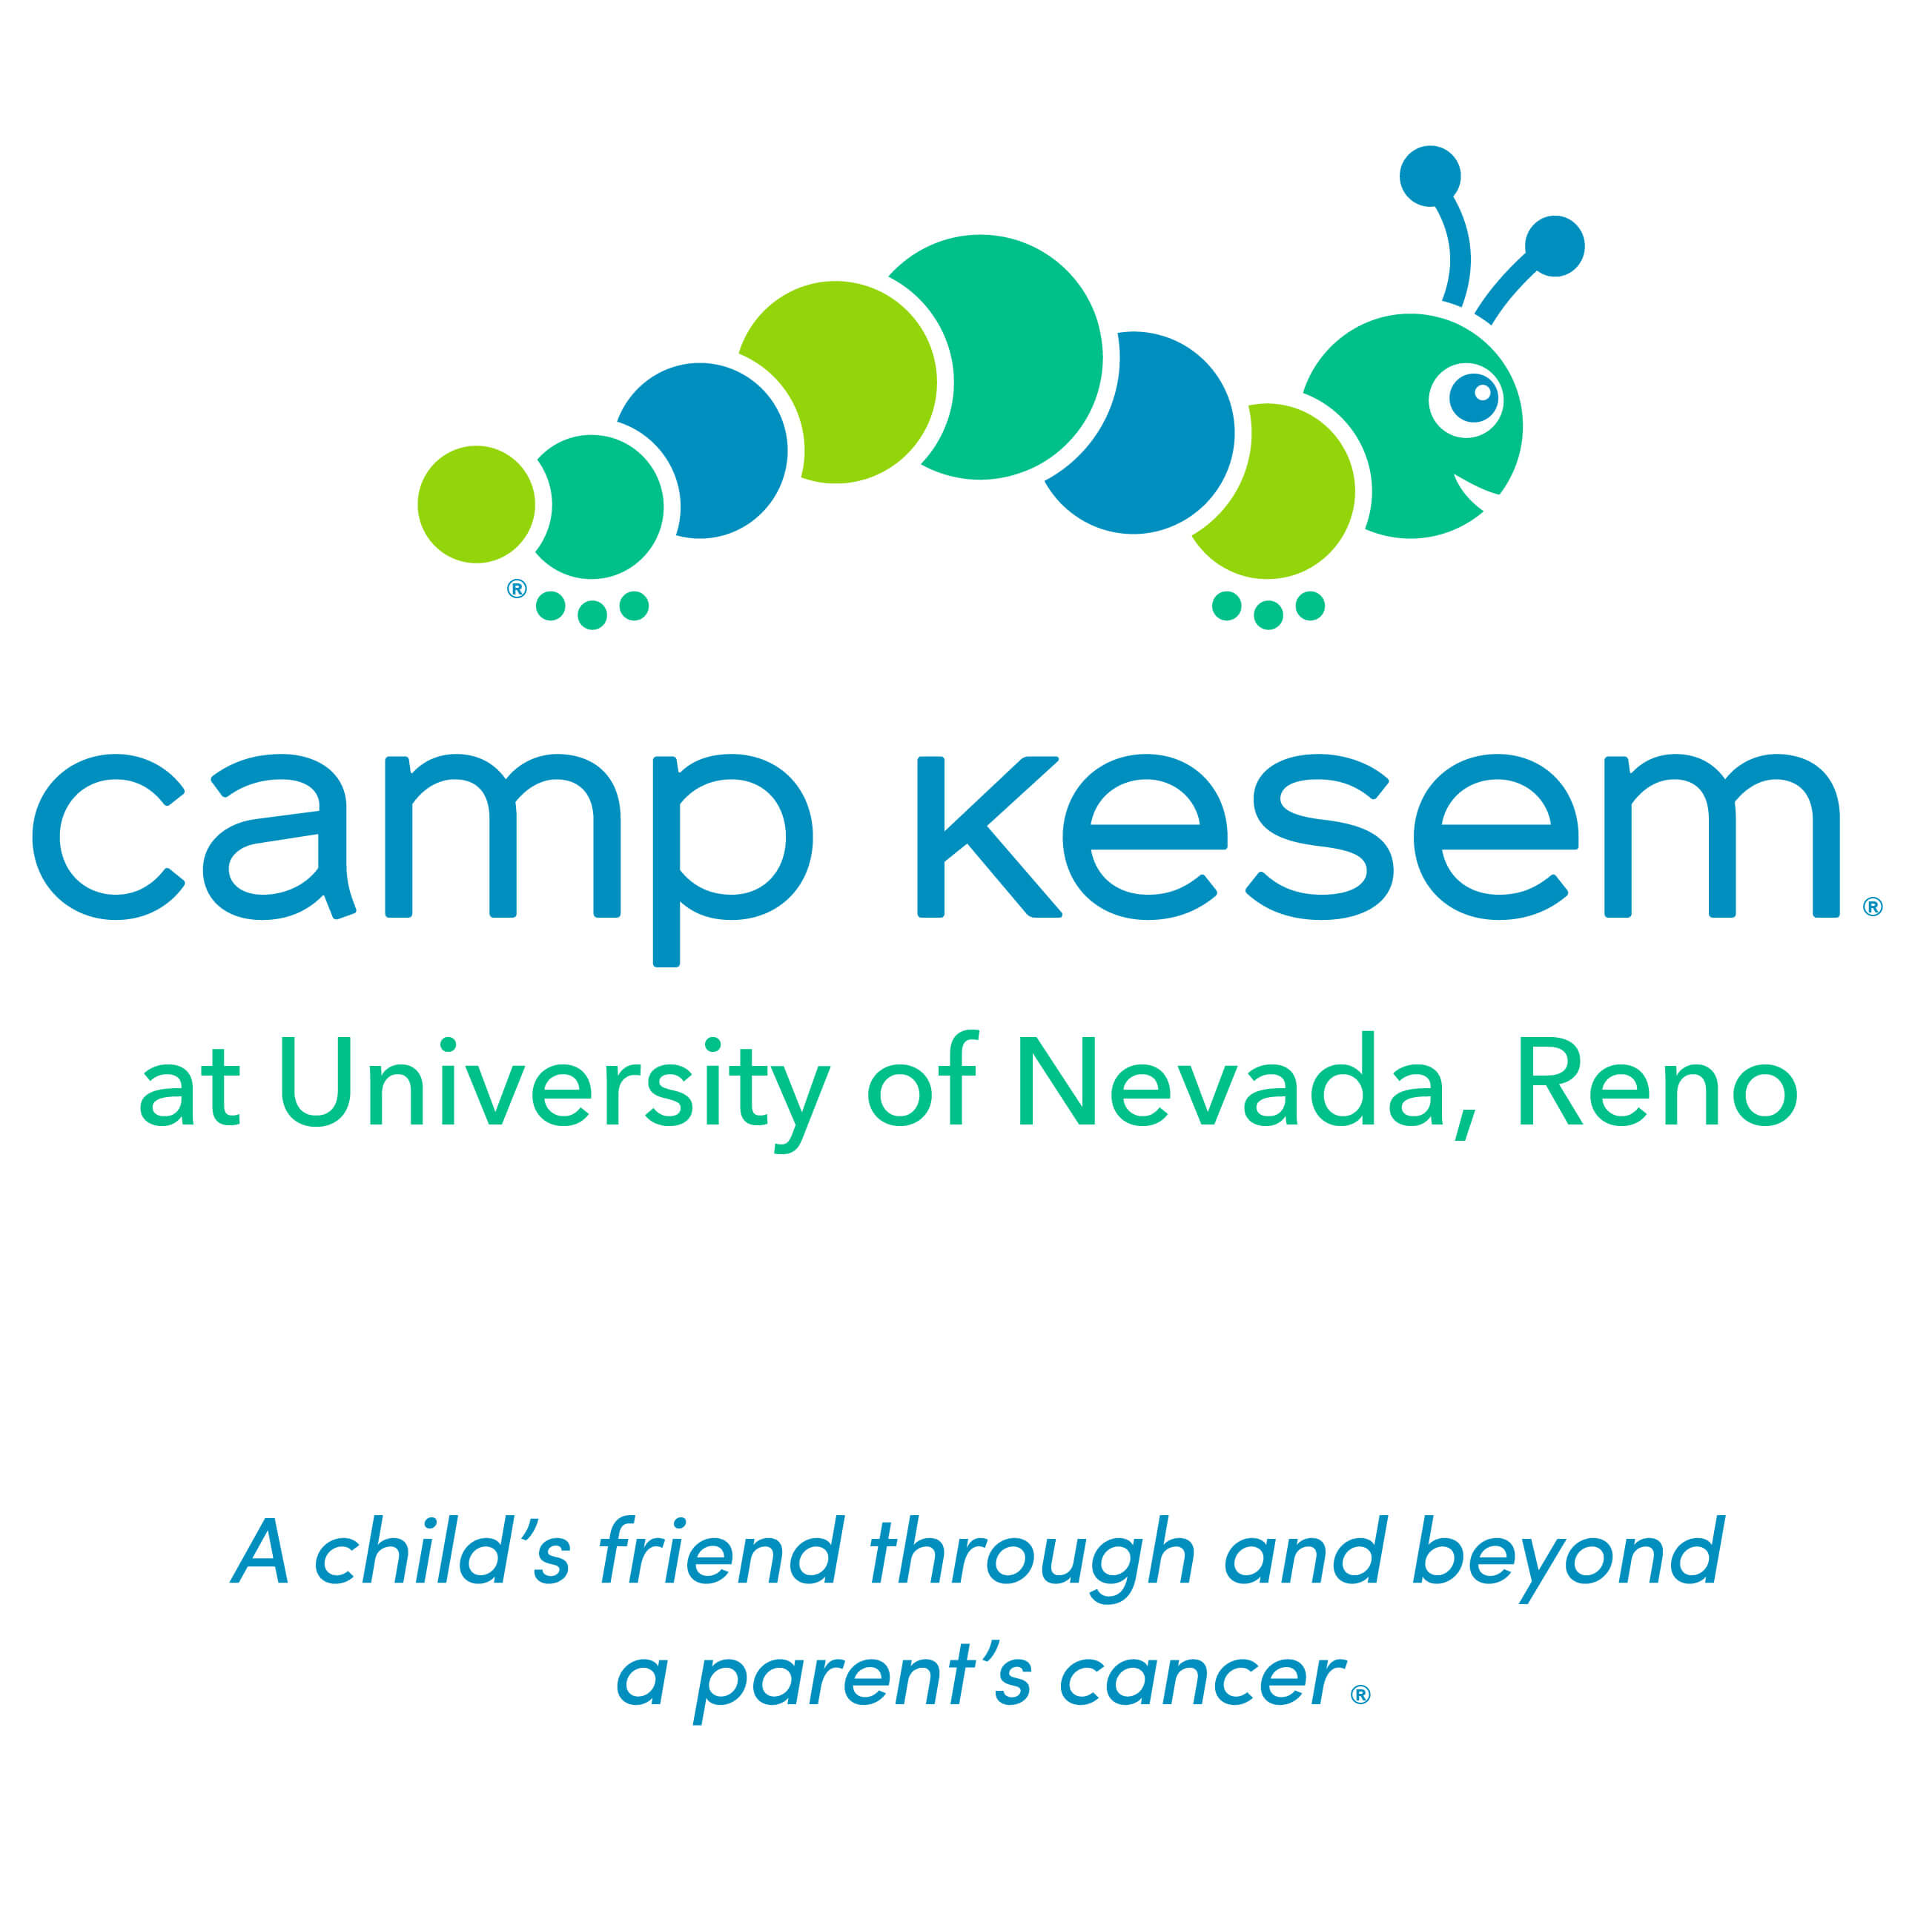 Camp Kesem at University of Nevada, Reno